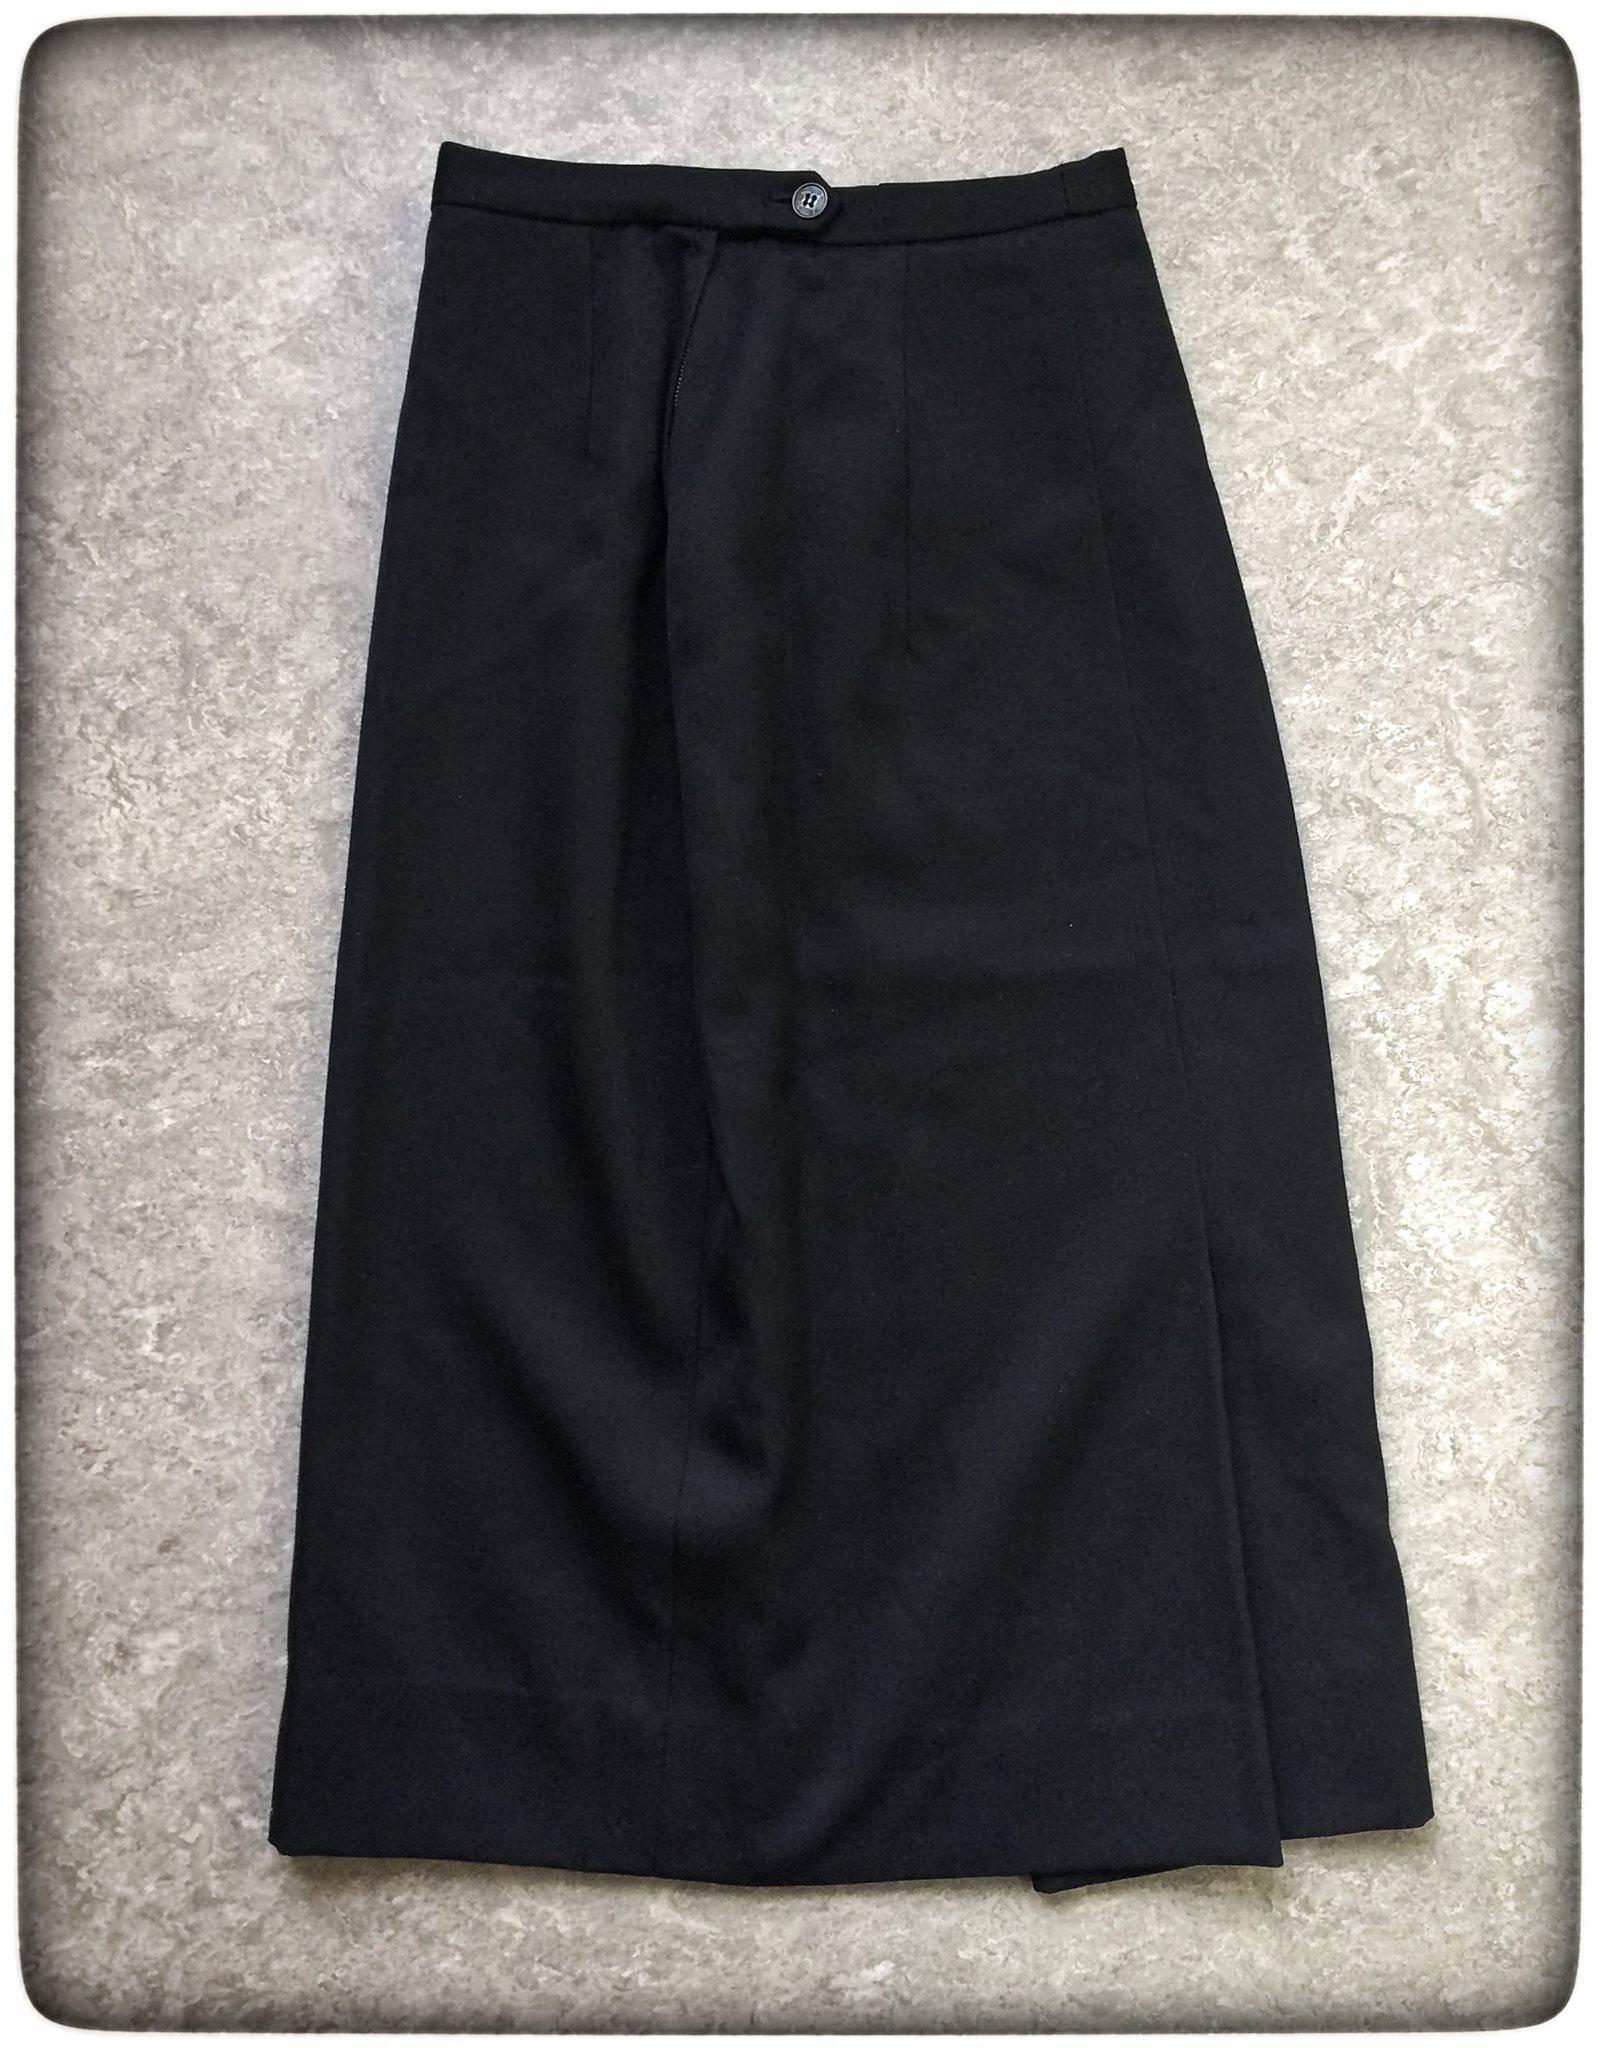 Geborell svart pennkjol stl 34 sprund 1940-tal VINTAGE omlottsprund kjol